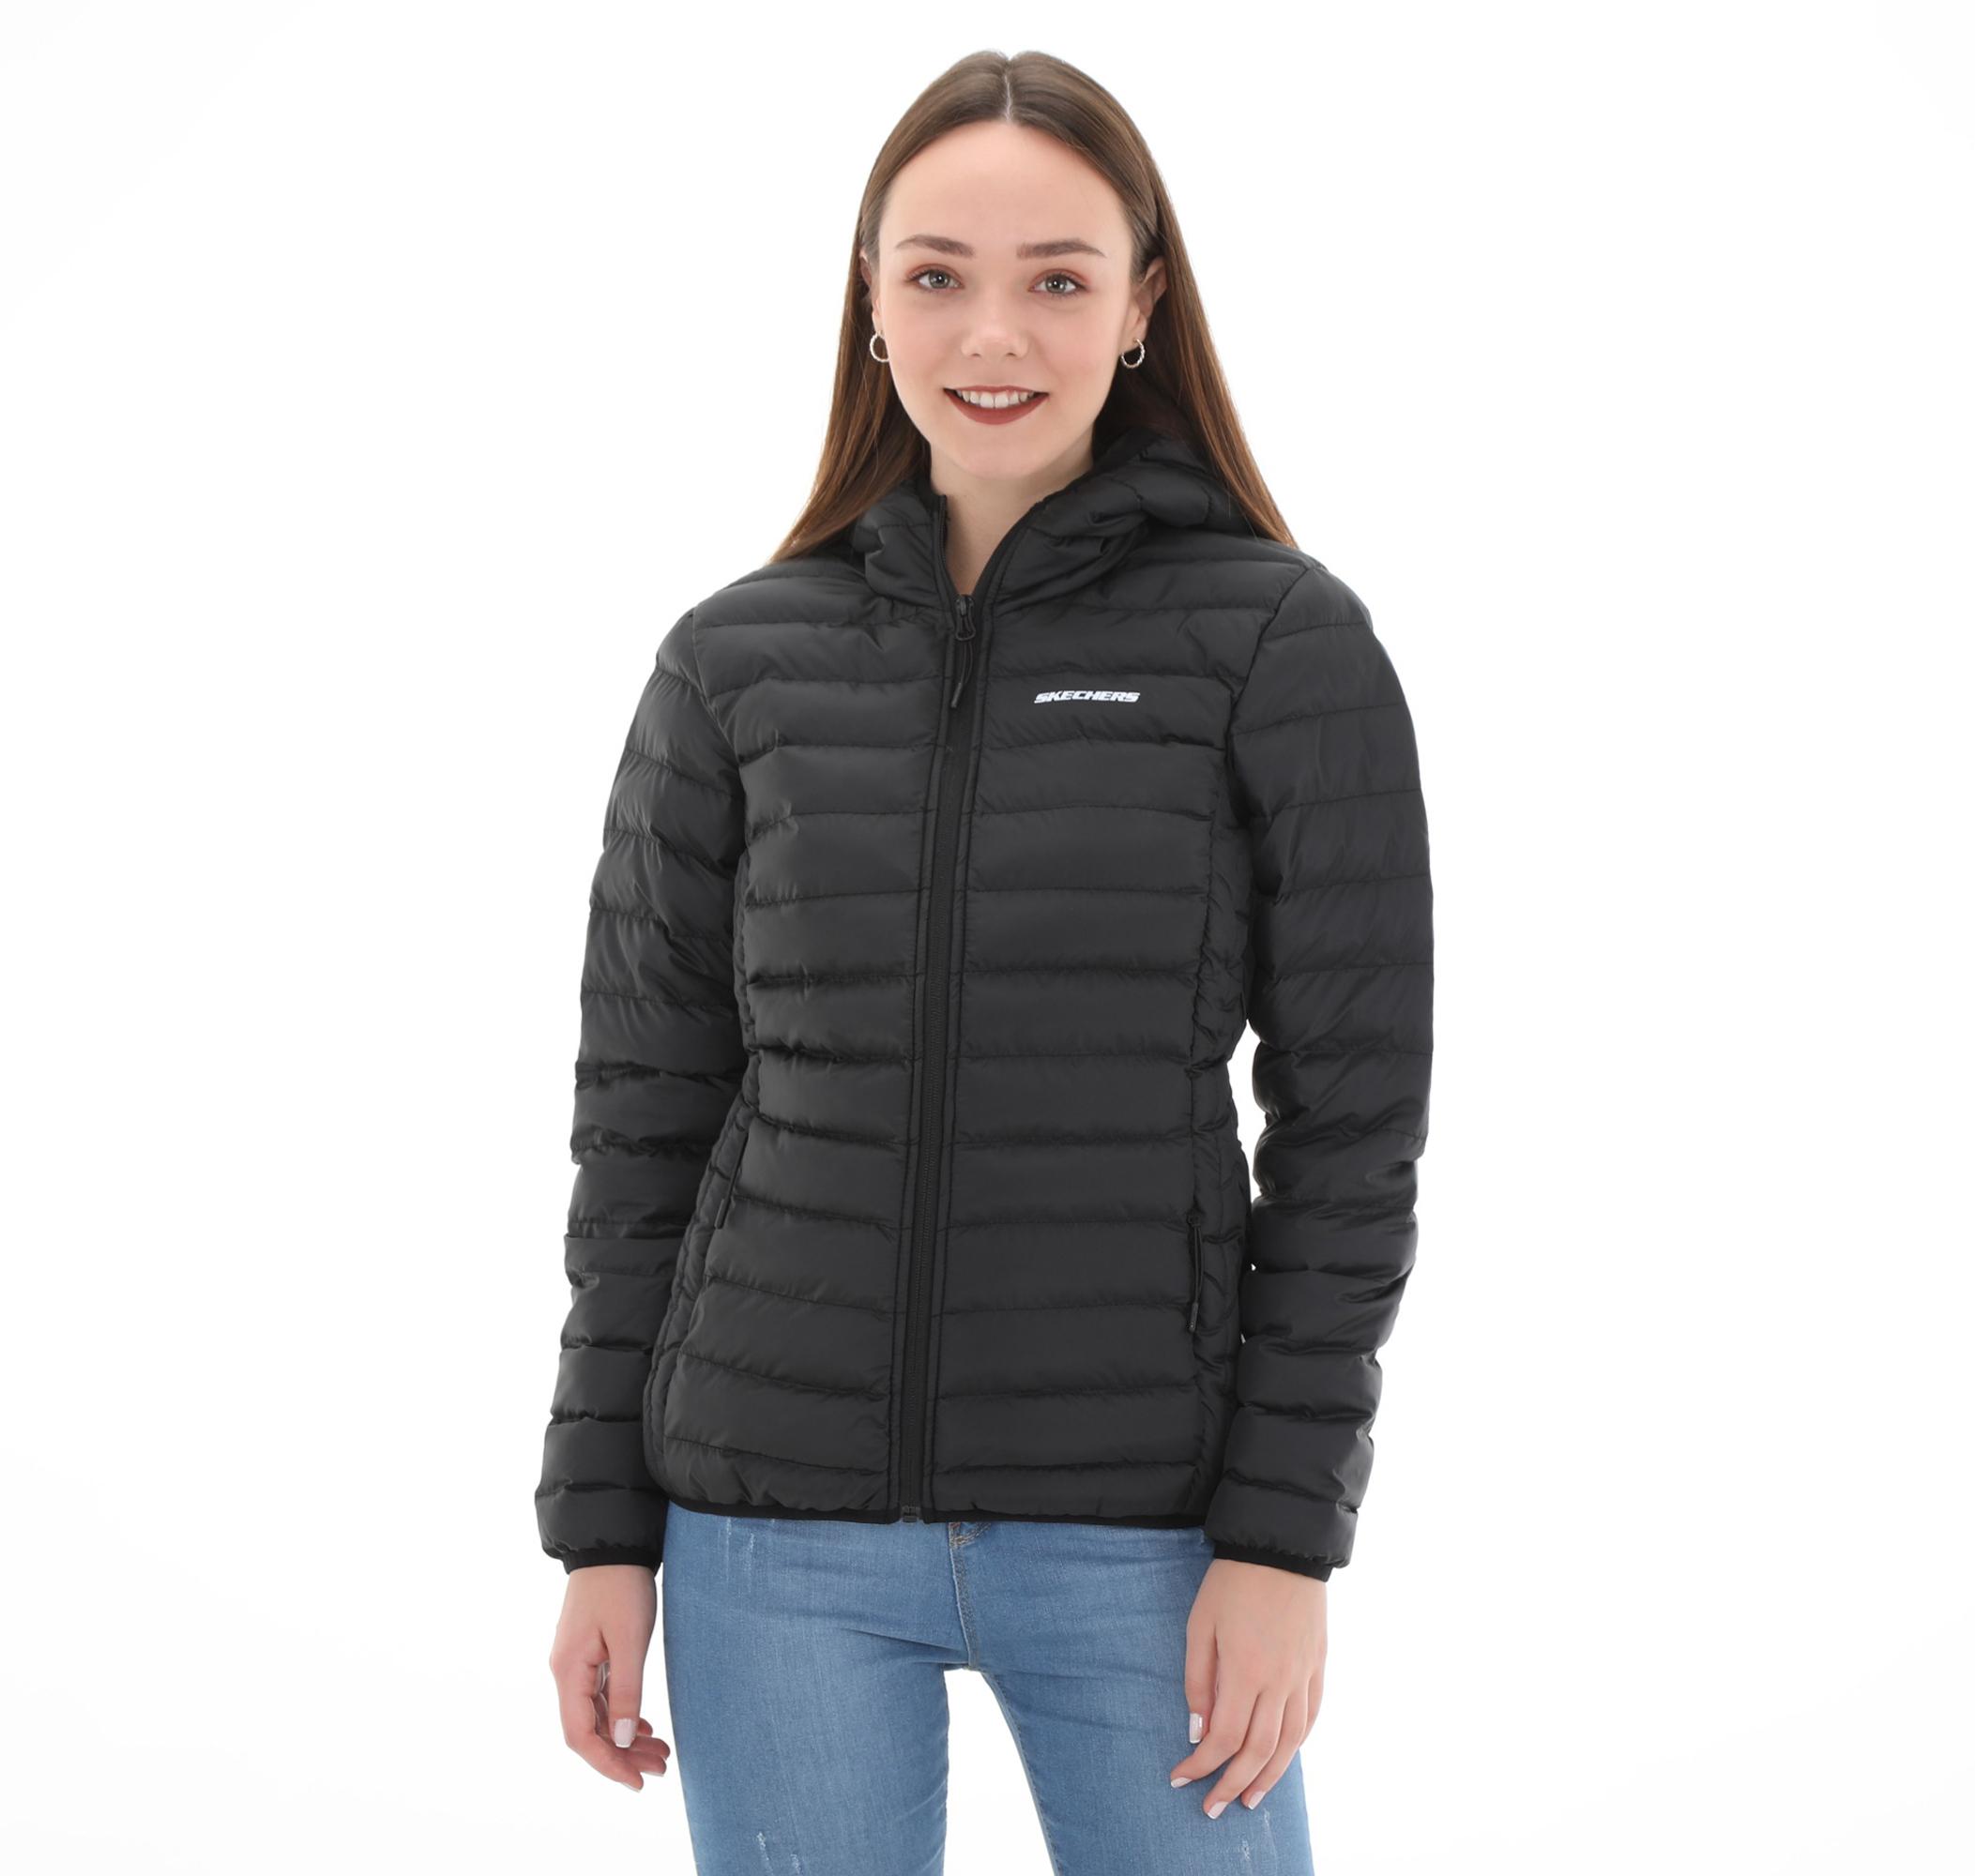 W Filled Hood Jacket Kadın Mont Siyah